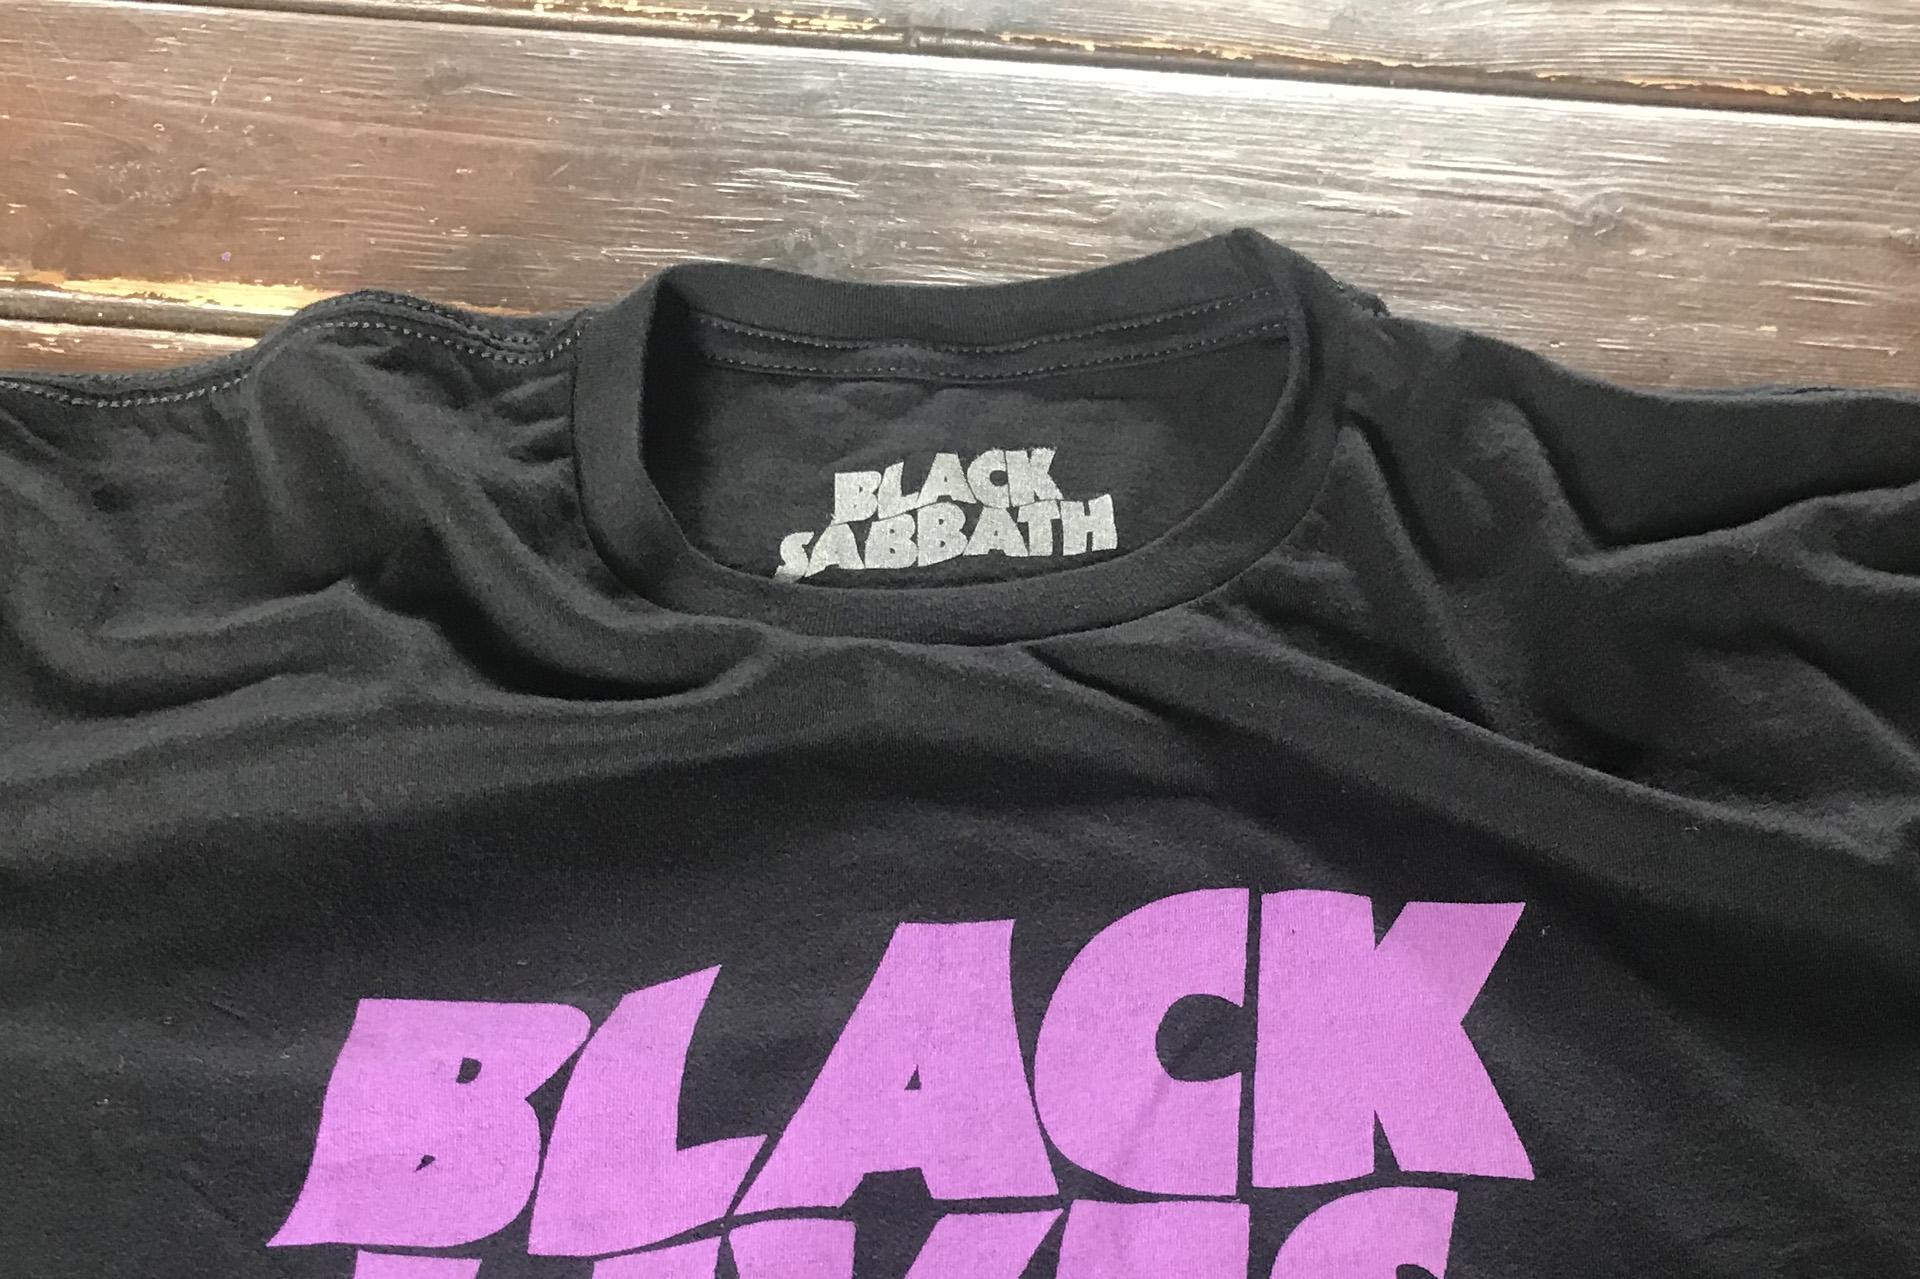 BLACKSABATH ブラックサバス チャリティ BLACKLIVESMATTER ブラックライブスマター